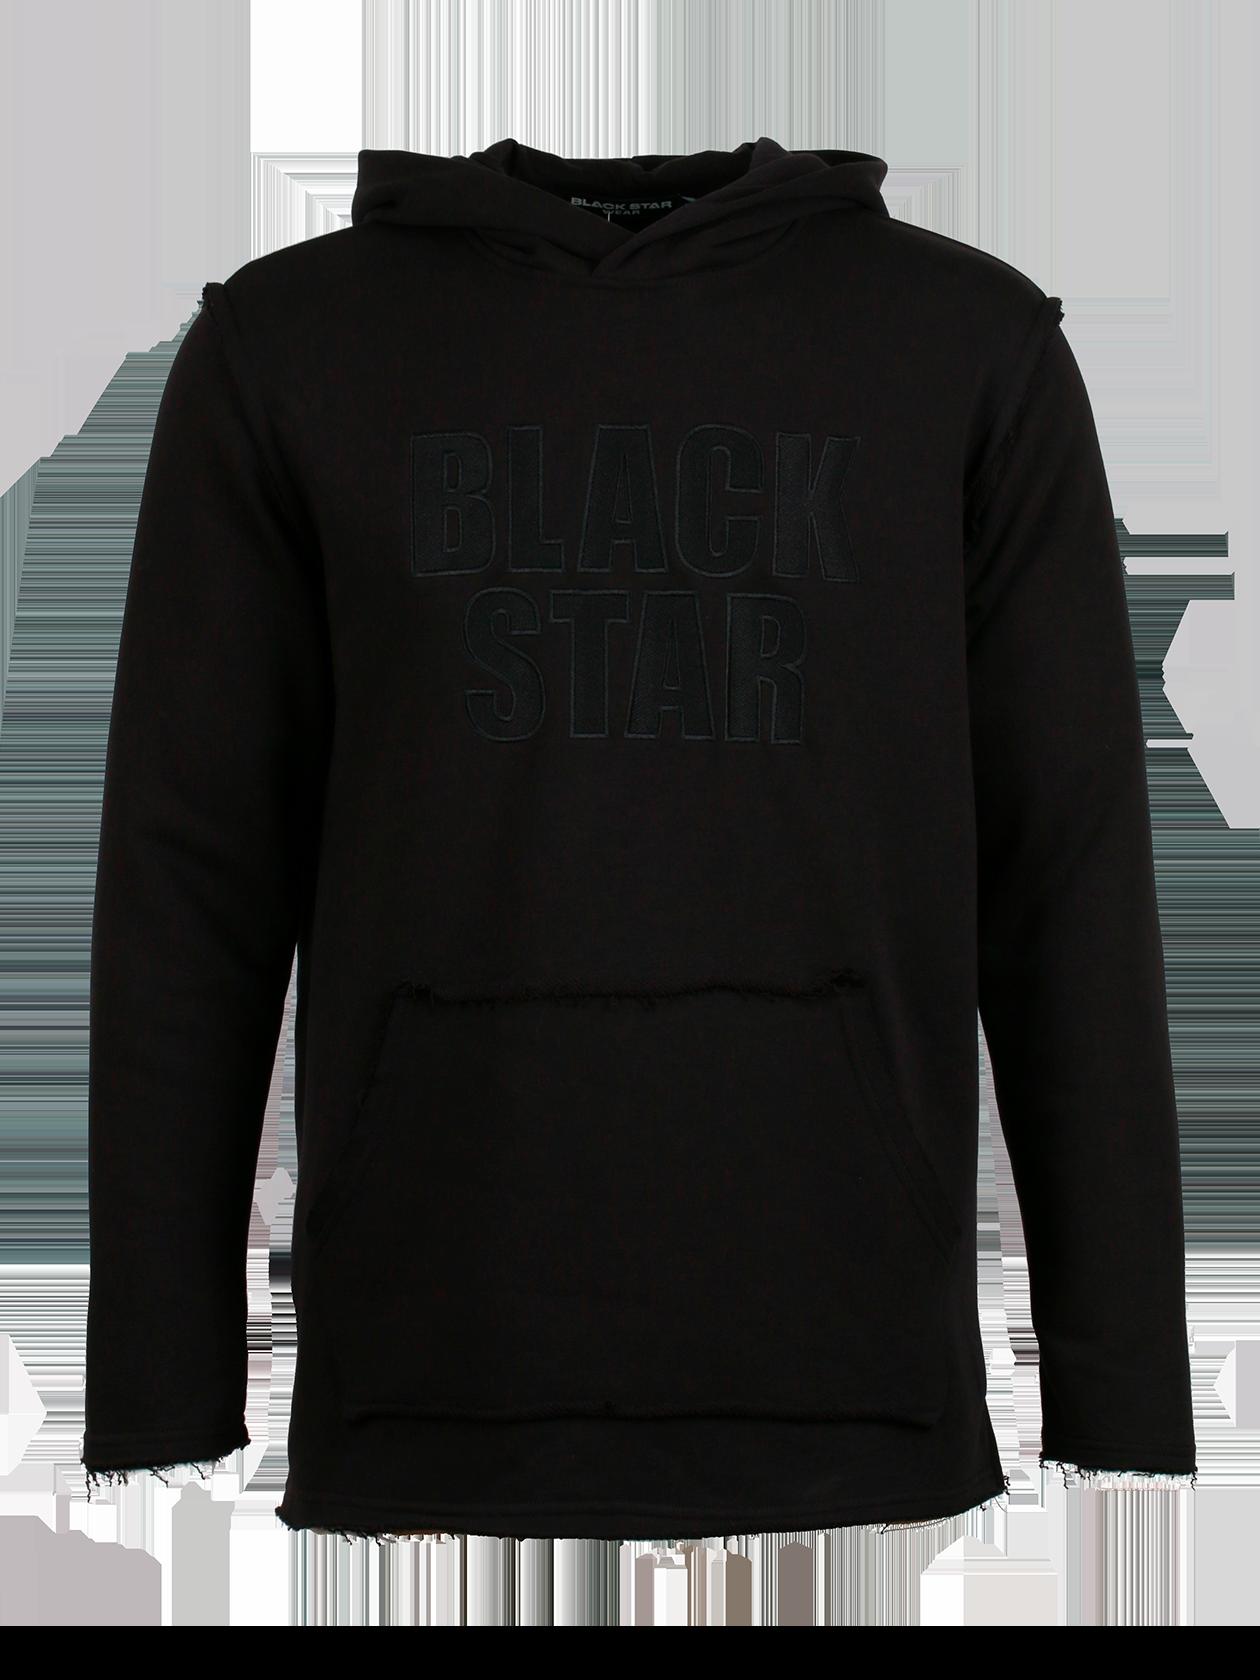 Толстовка унисекс INSIDE OUT от Black Star Wear